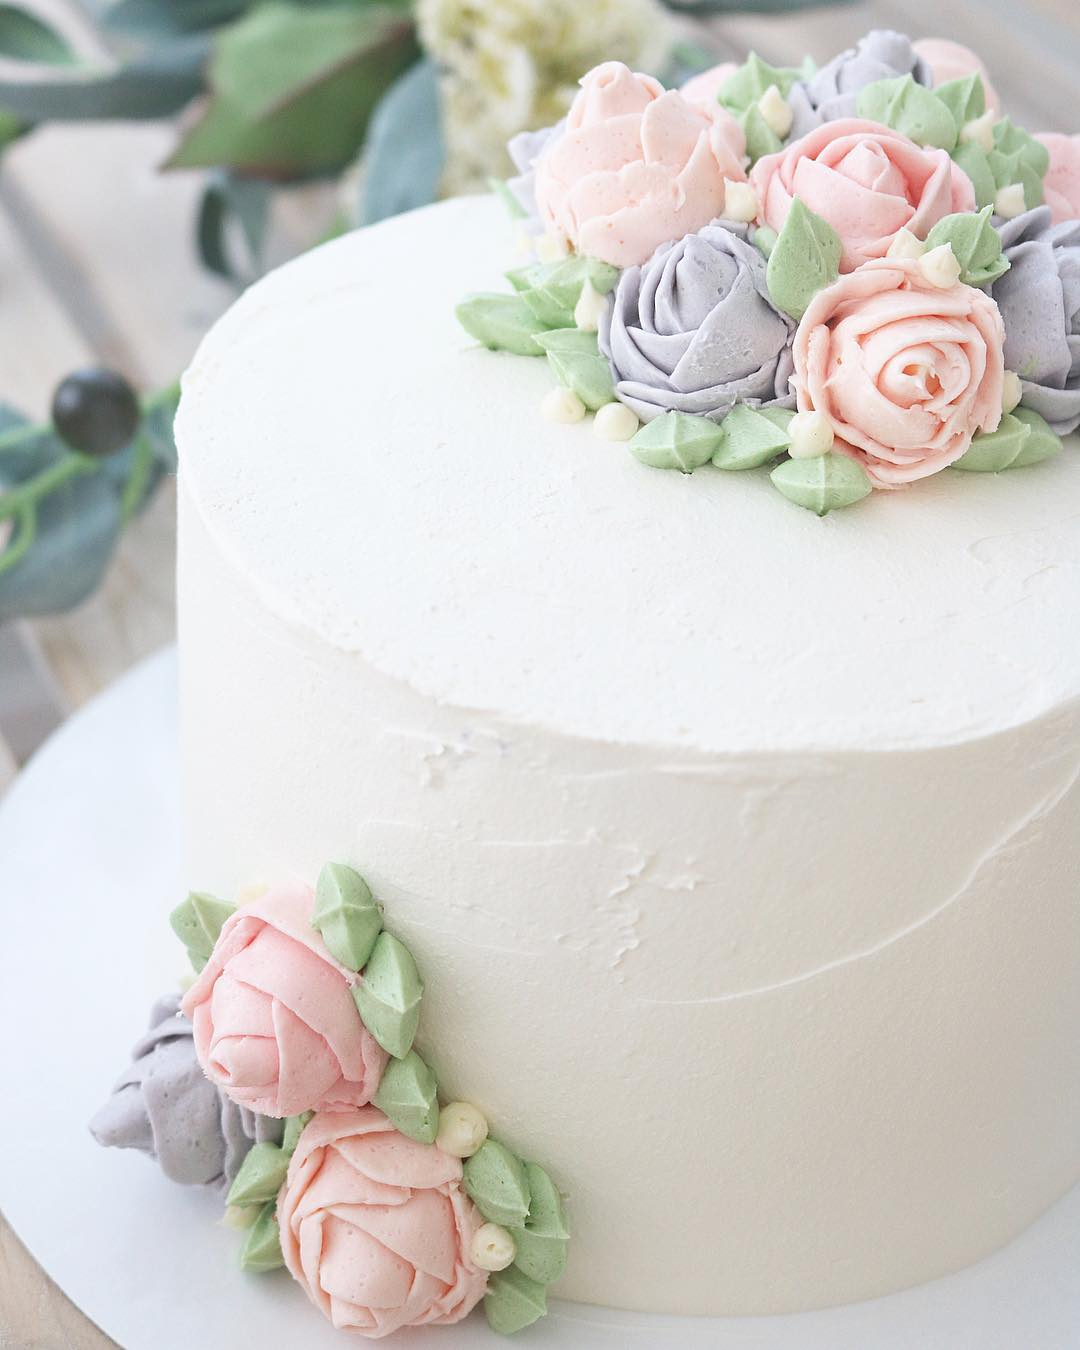 Tarta blanca detalle flores